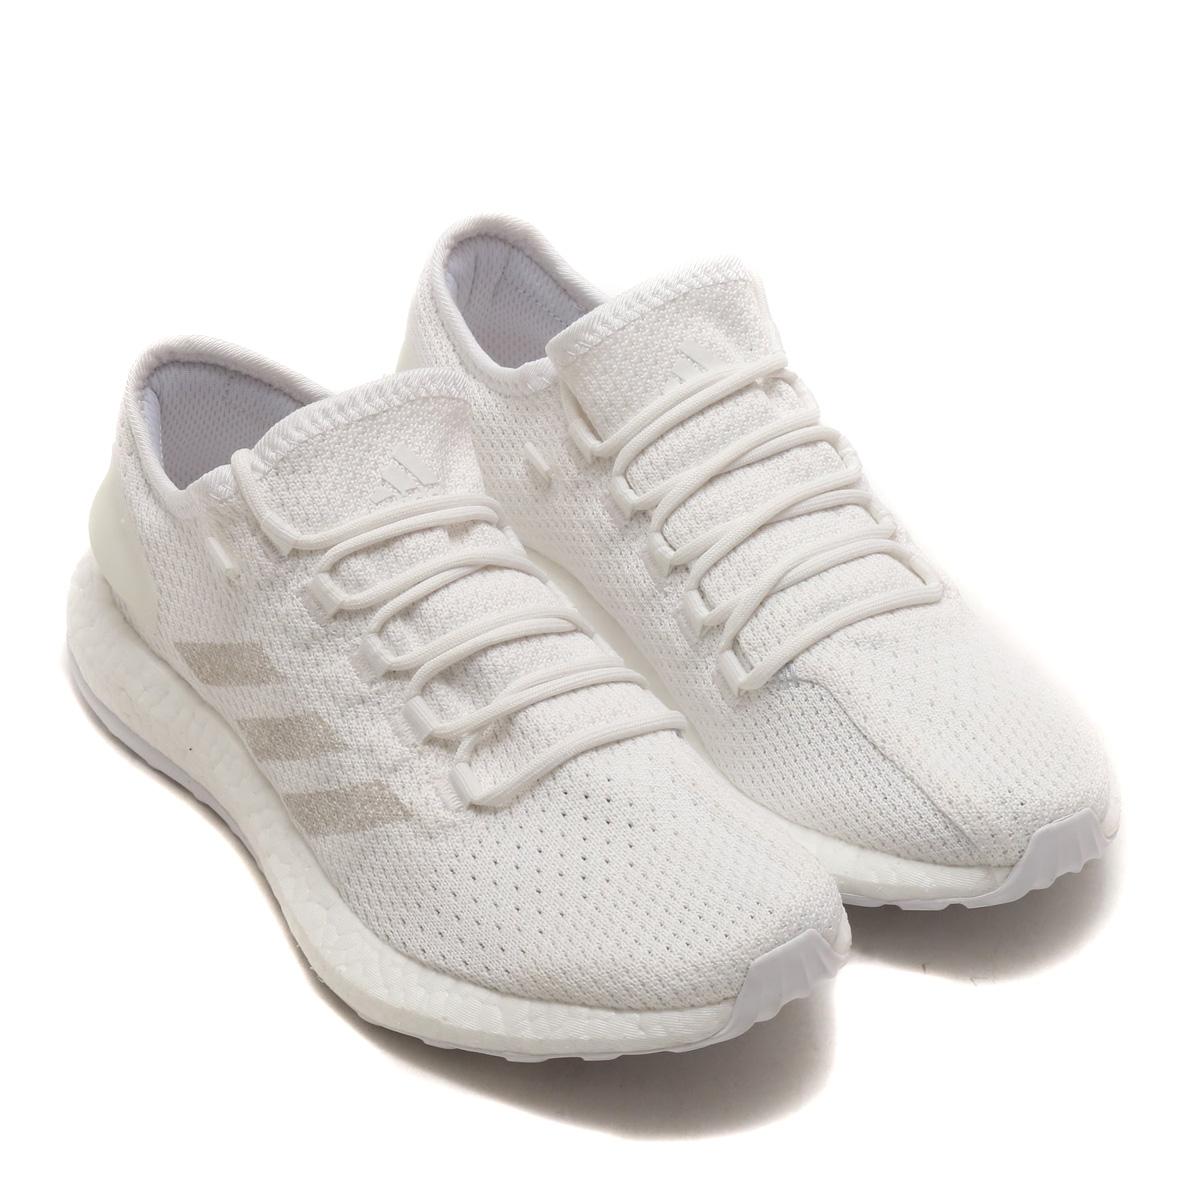 adidas PureBOOST CLIMA (アディダス ピュアブースト クライマ) Running White/Grey/Crystal White【メンズ スニーカー】18SS-S